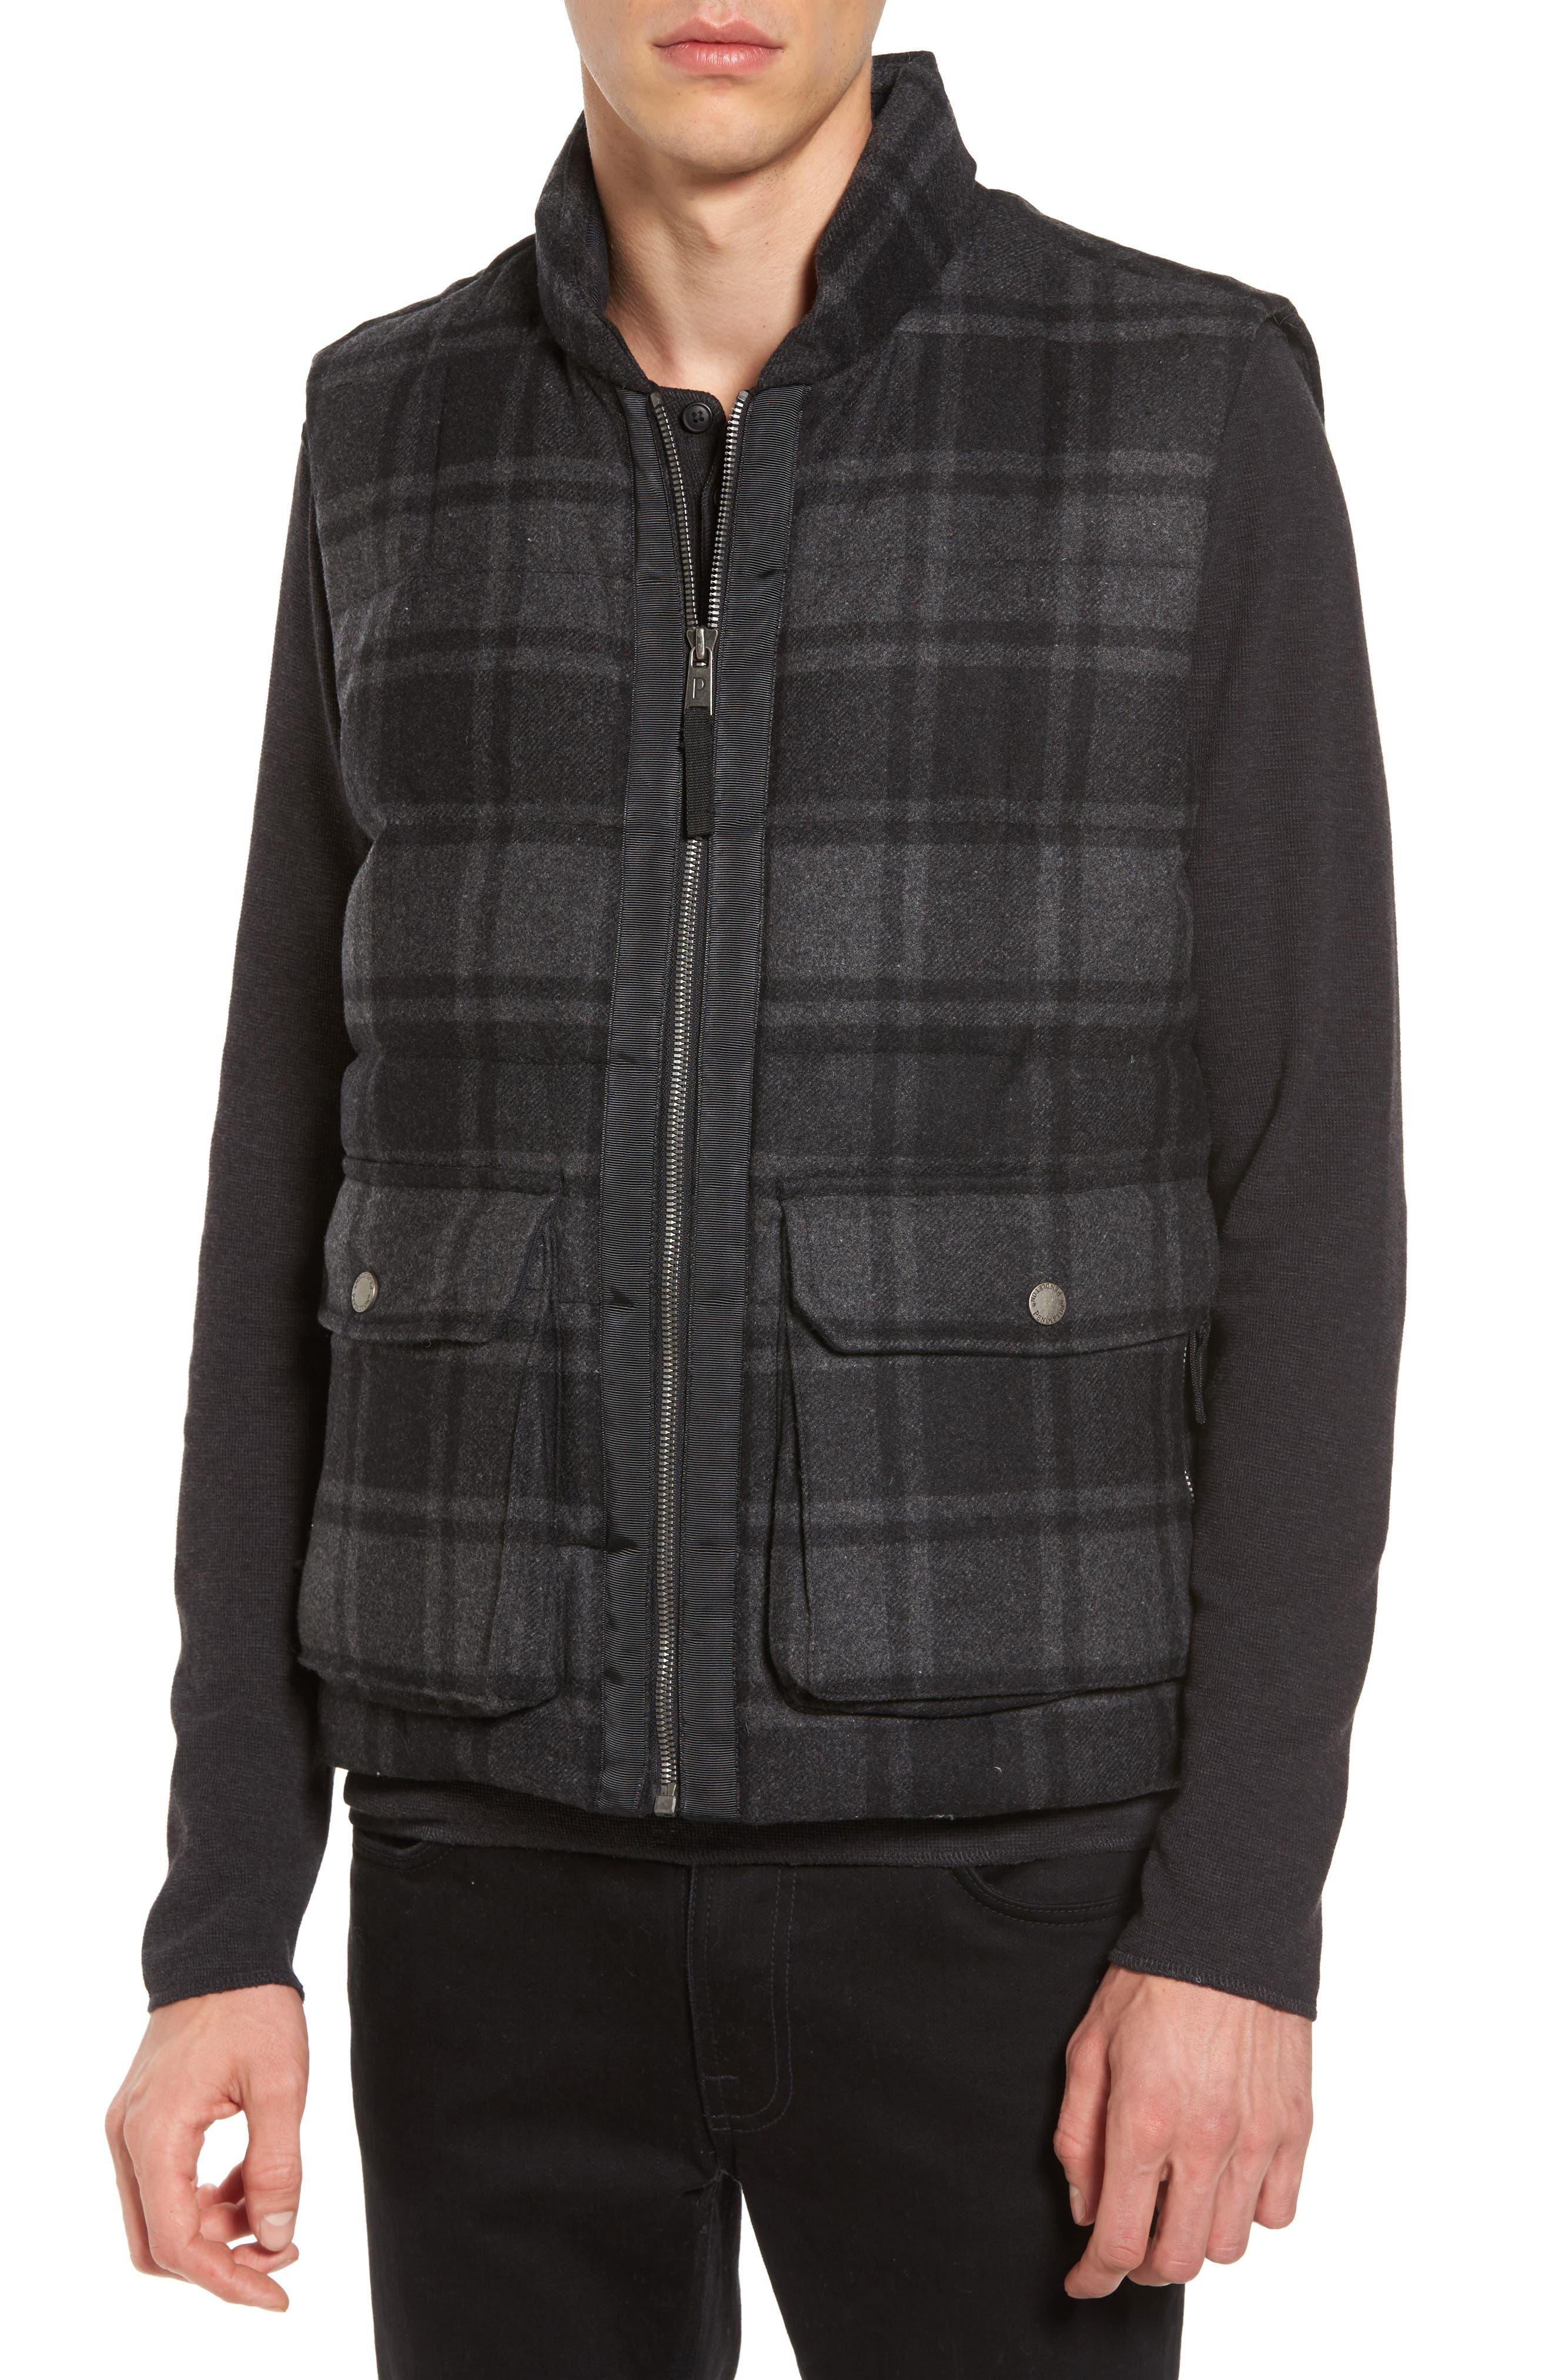 Yosemite Jacket,                             Alternate thumbnail 6, color,                             Black/ Charcoal Plaid